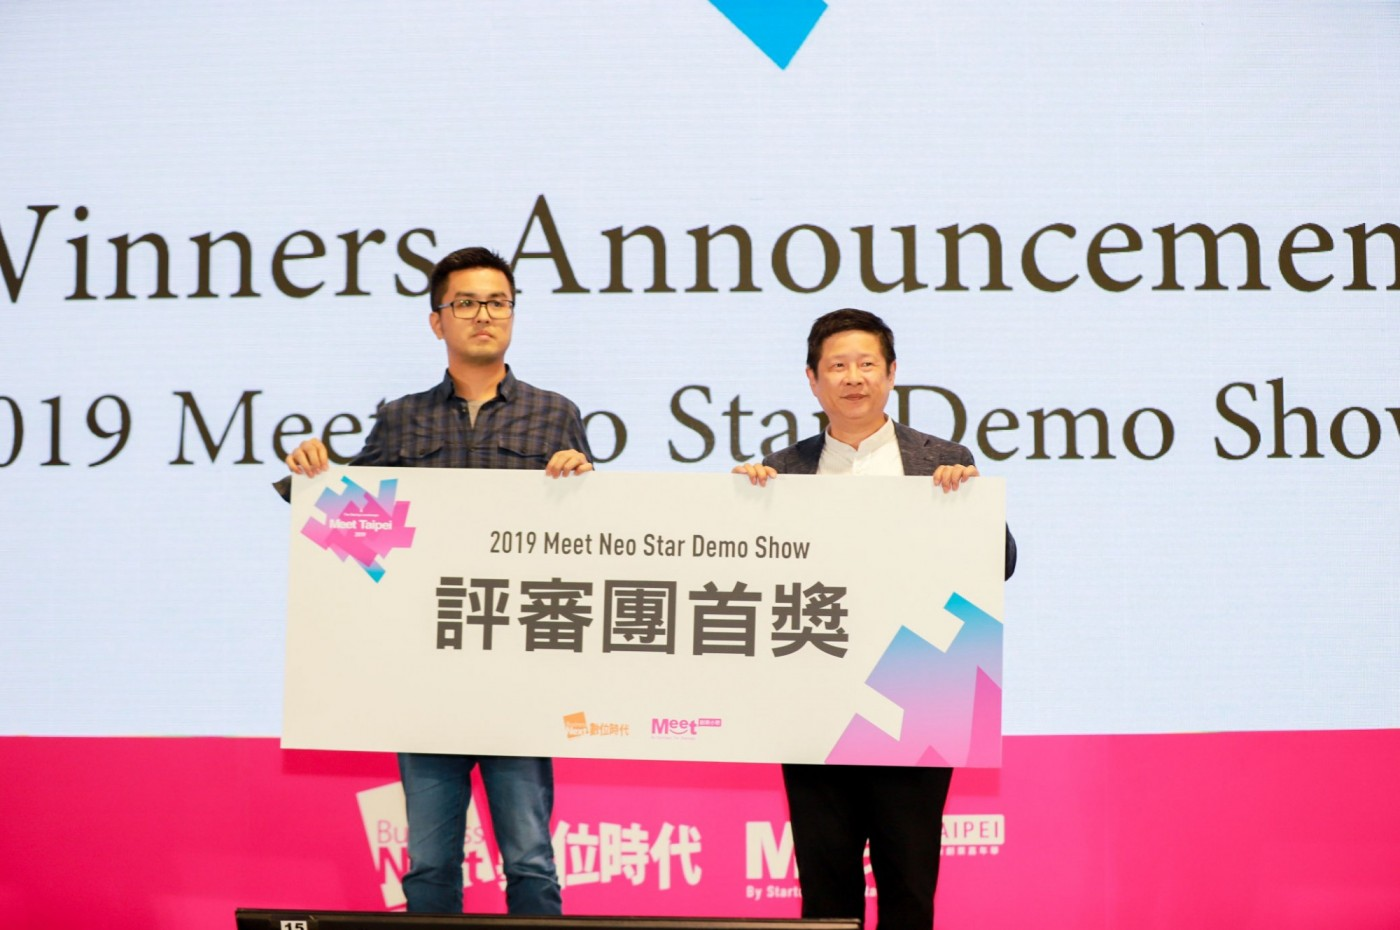 2019 Neo Star揭曉!首獎由AI語音管家犀動智能奪得,5G、區塊鏈團隊也是贏家